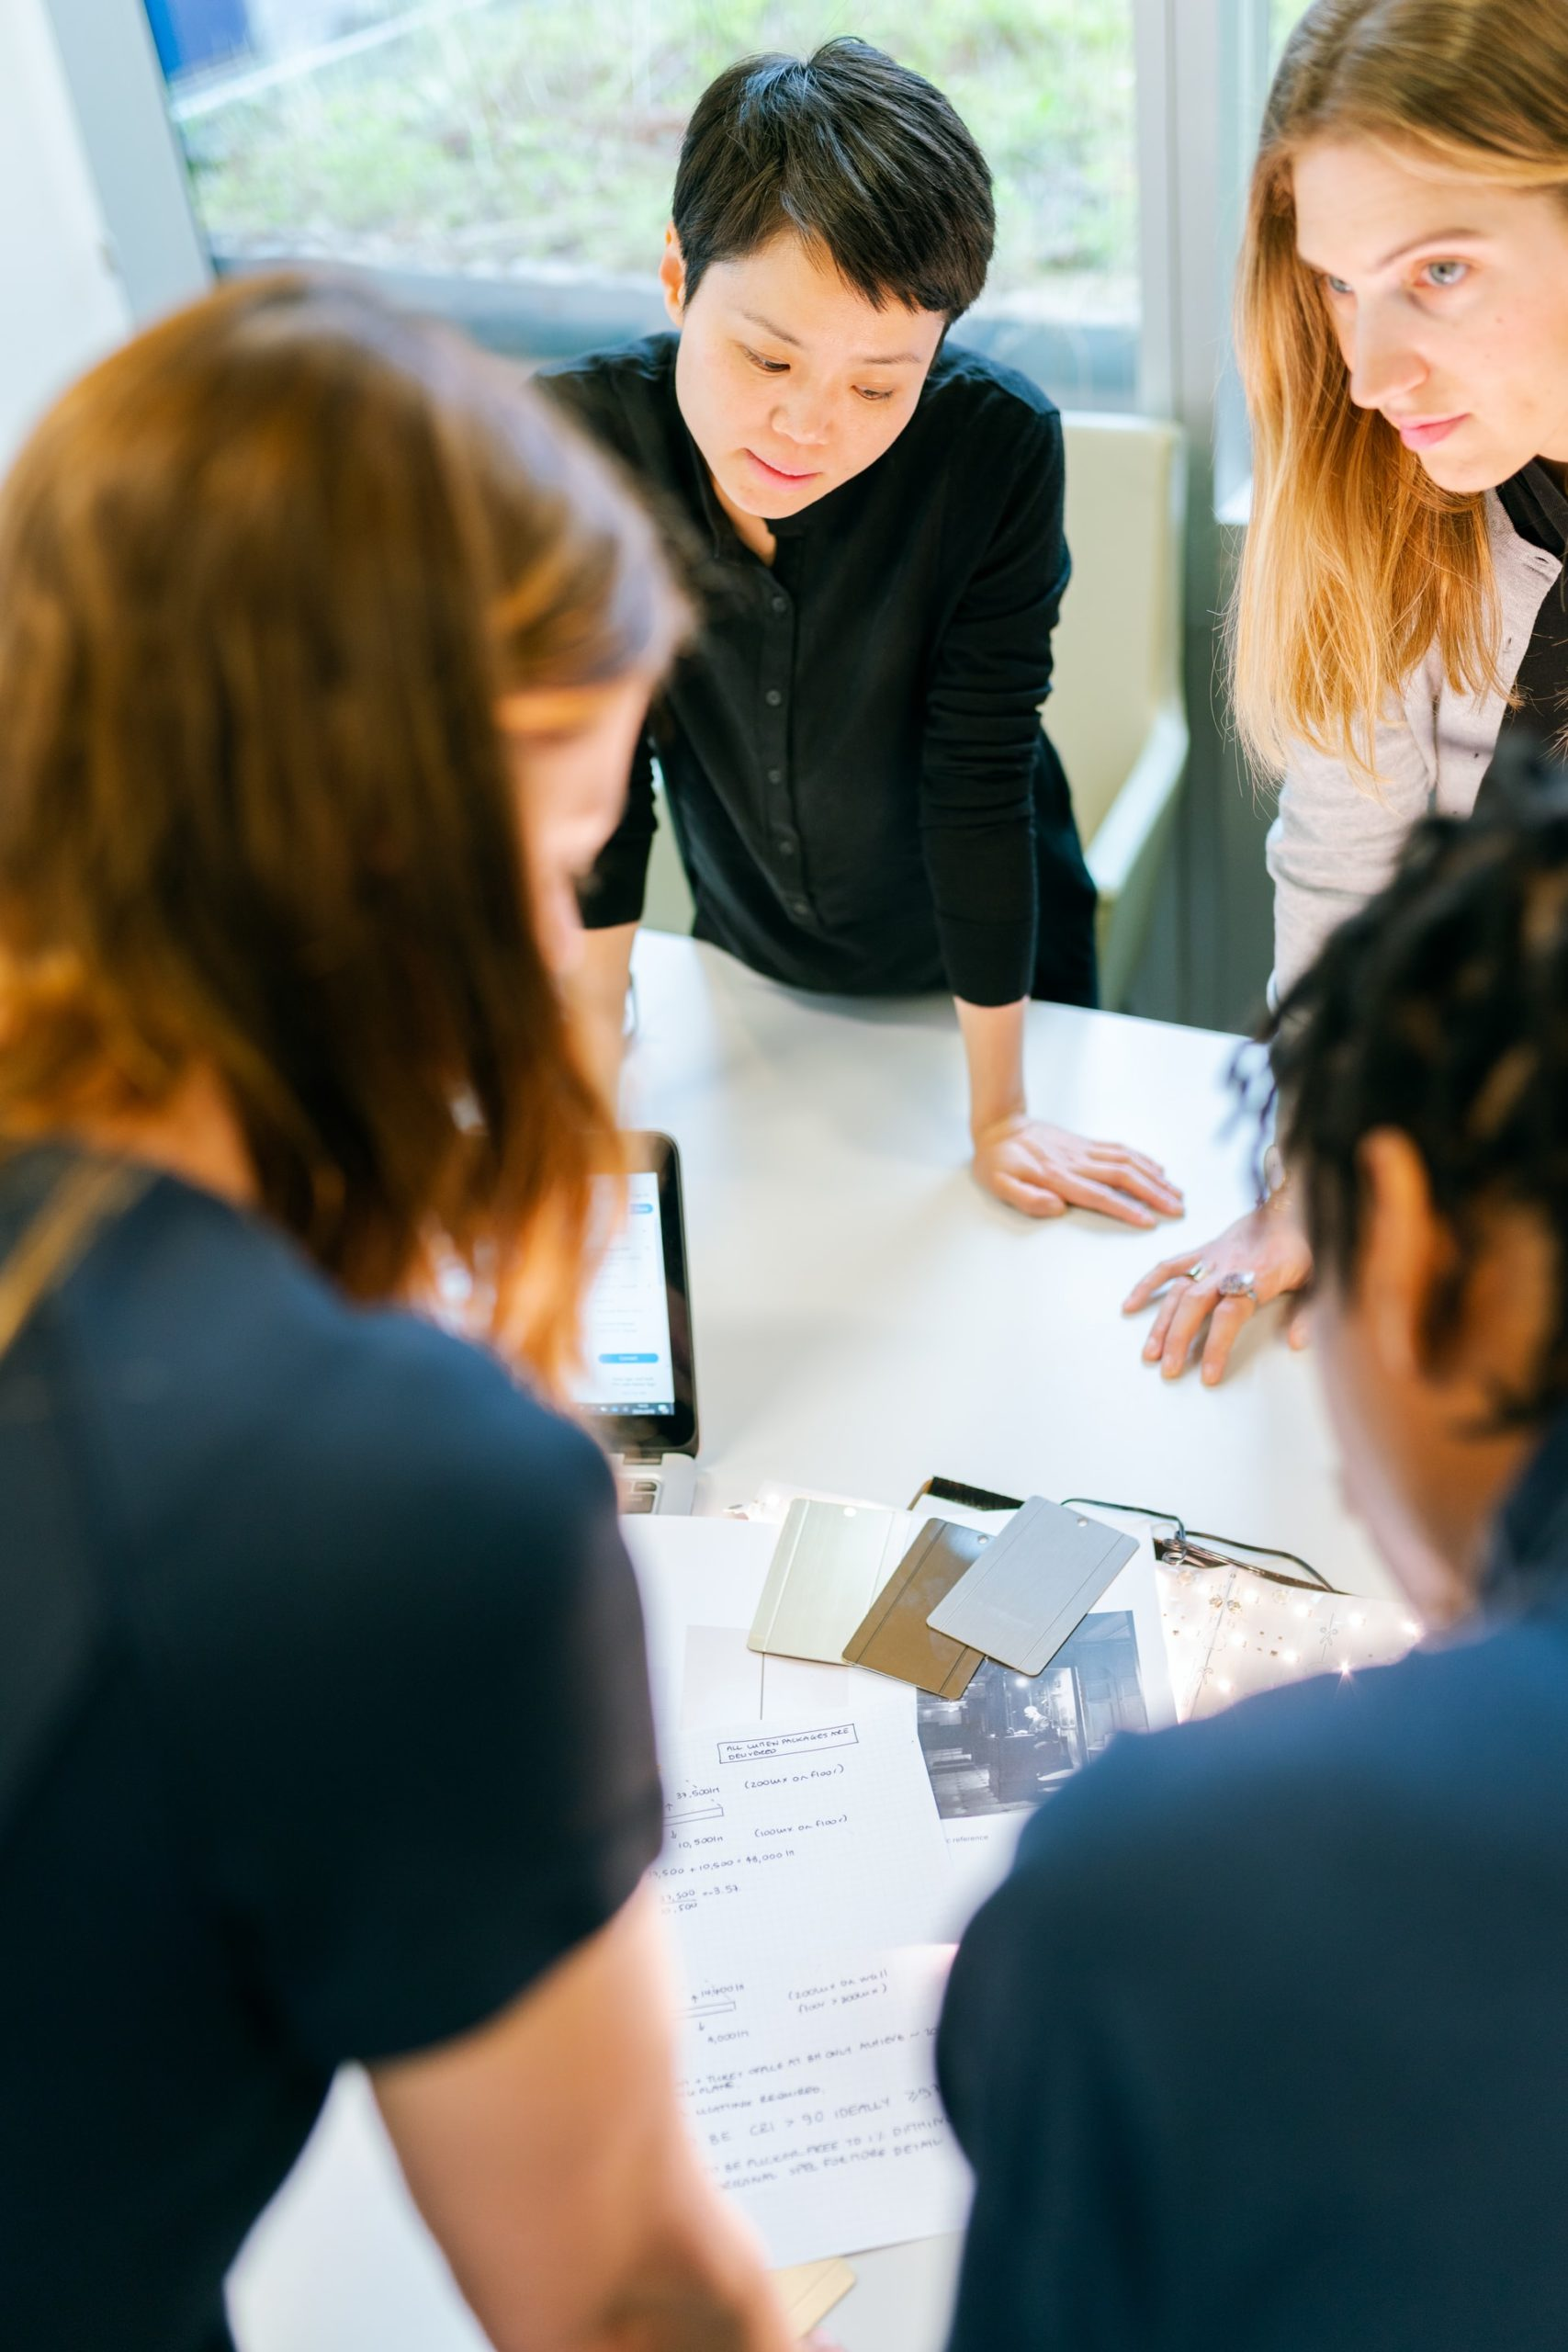 Group meeting - Unsplash